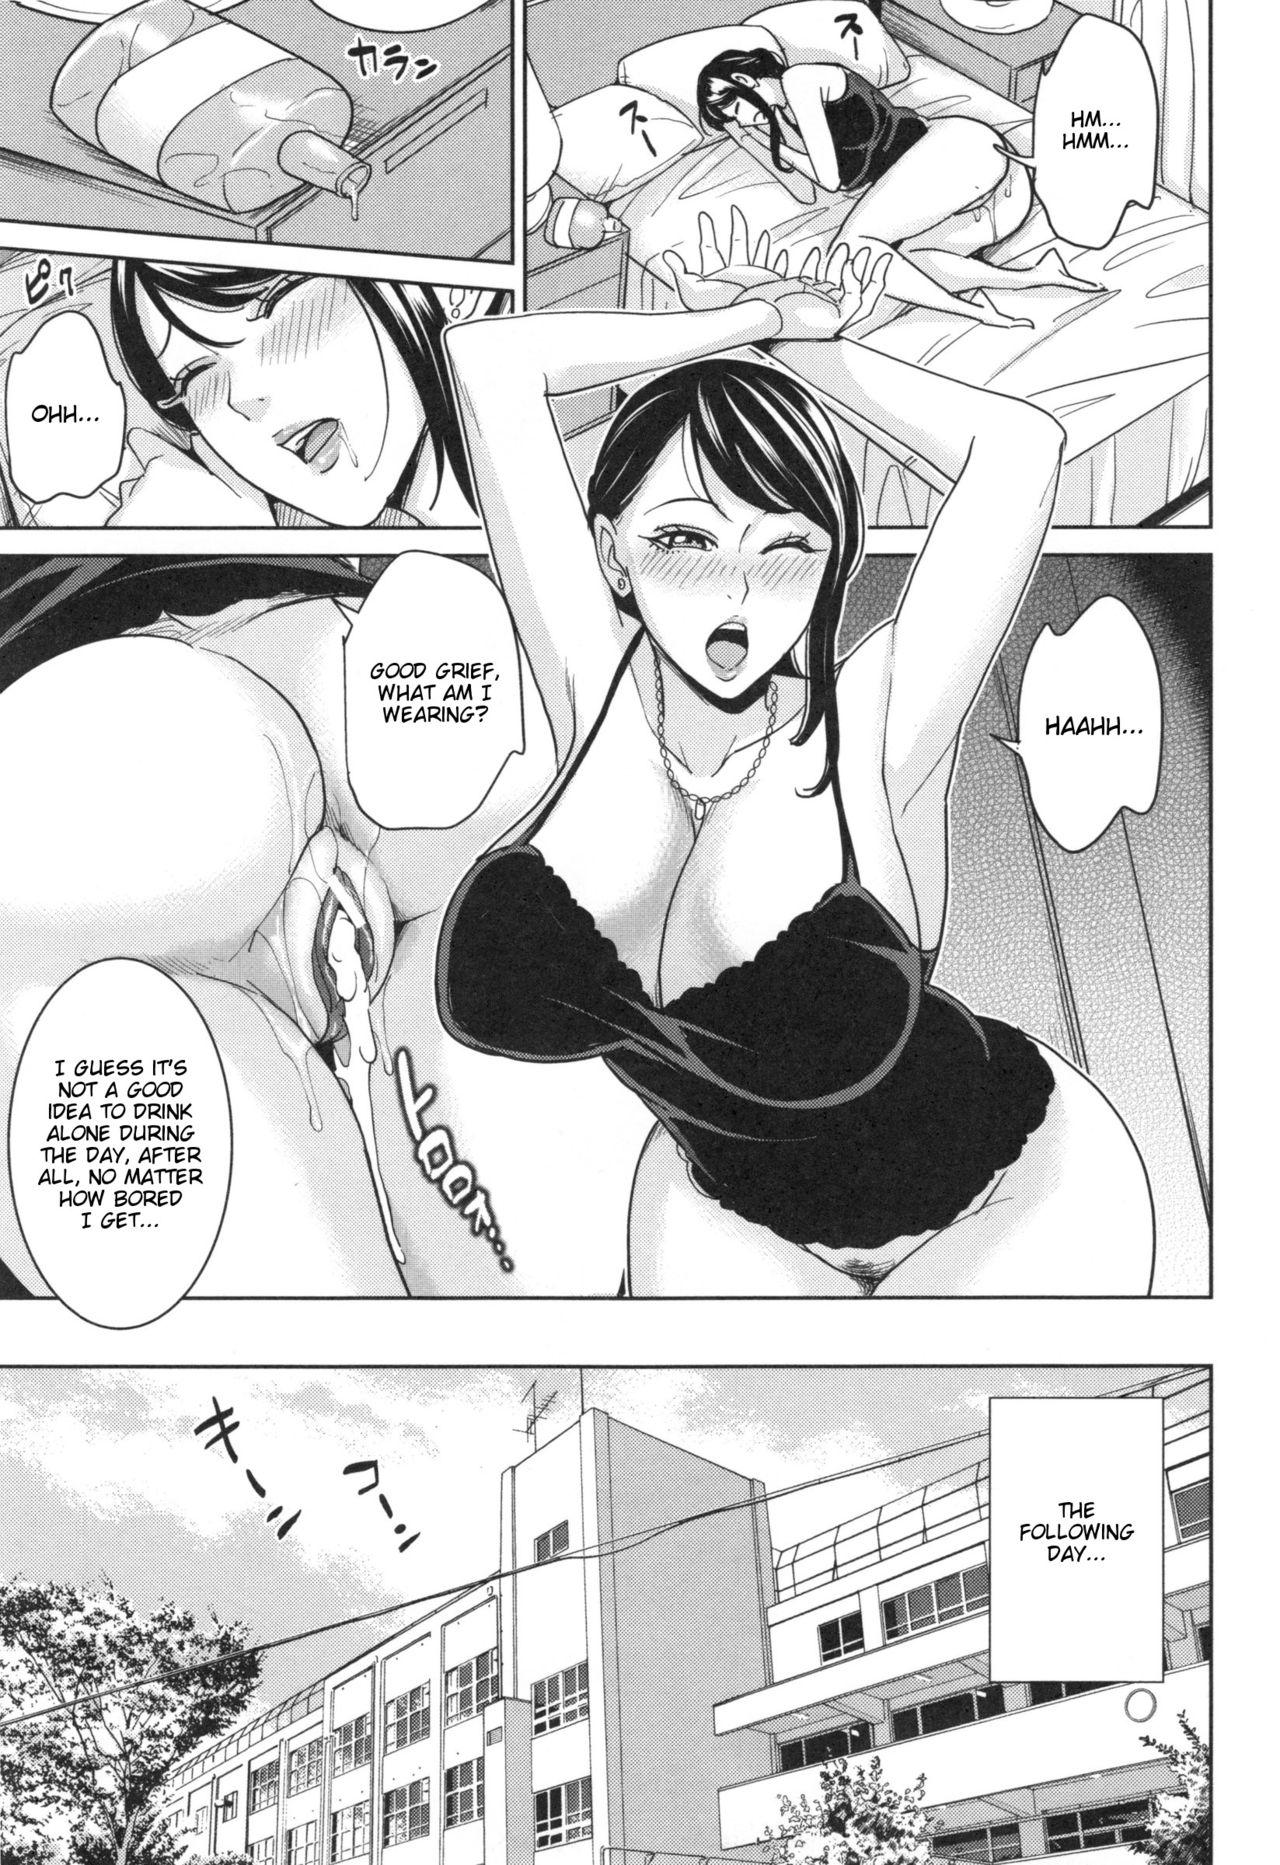 [Maimu-Maimu] Aniyome Bitch Life | Sister-in-Law Slut Life [English] {Taihen Zombii} 123